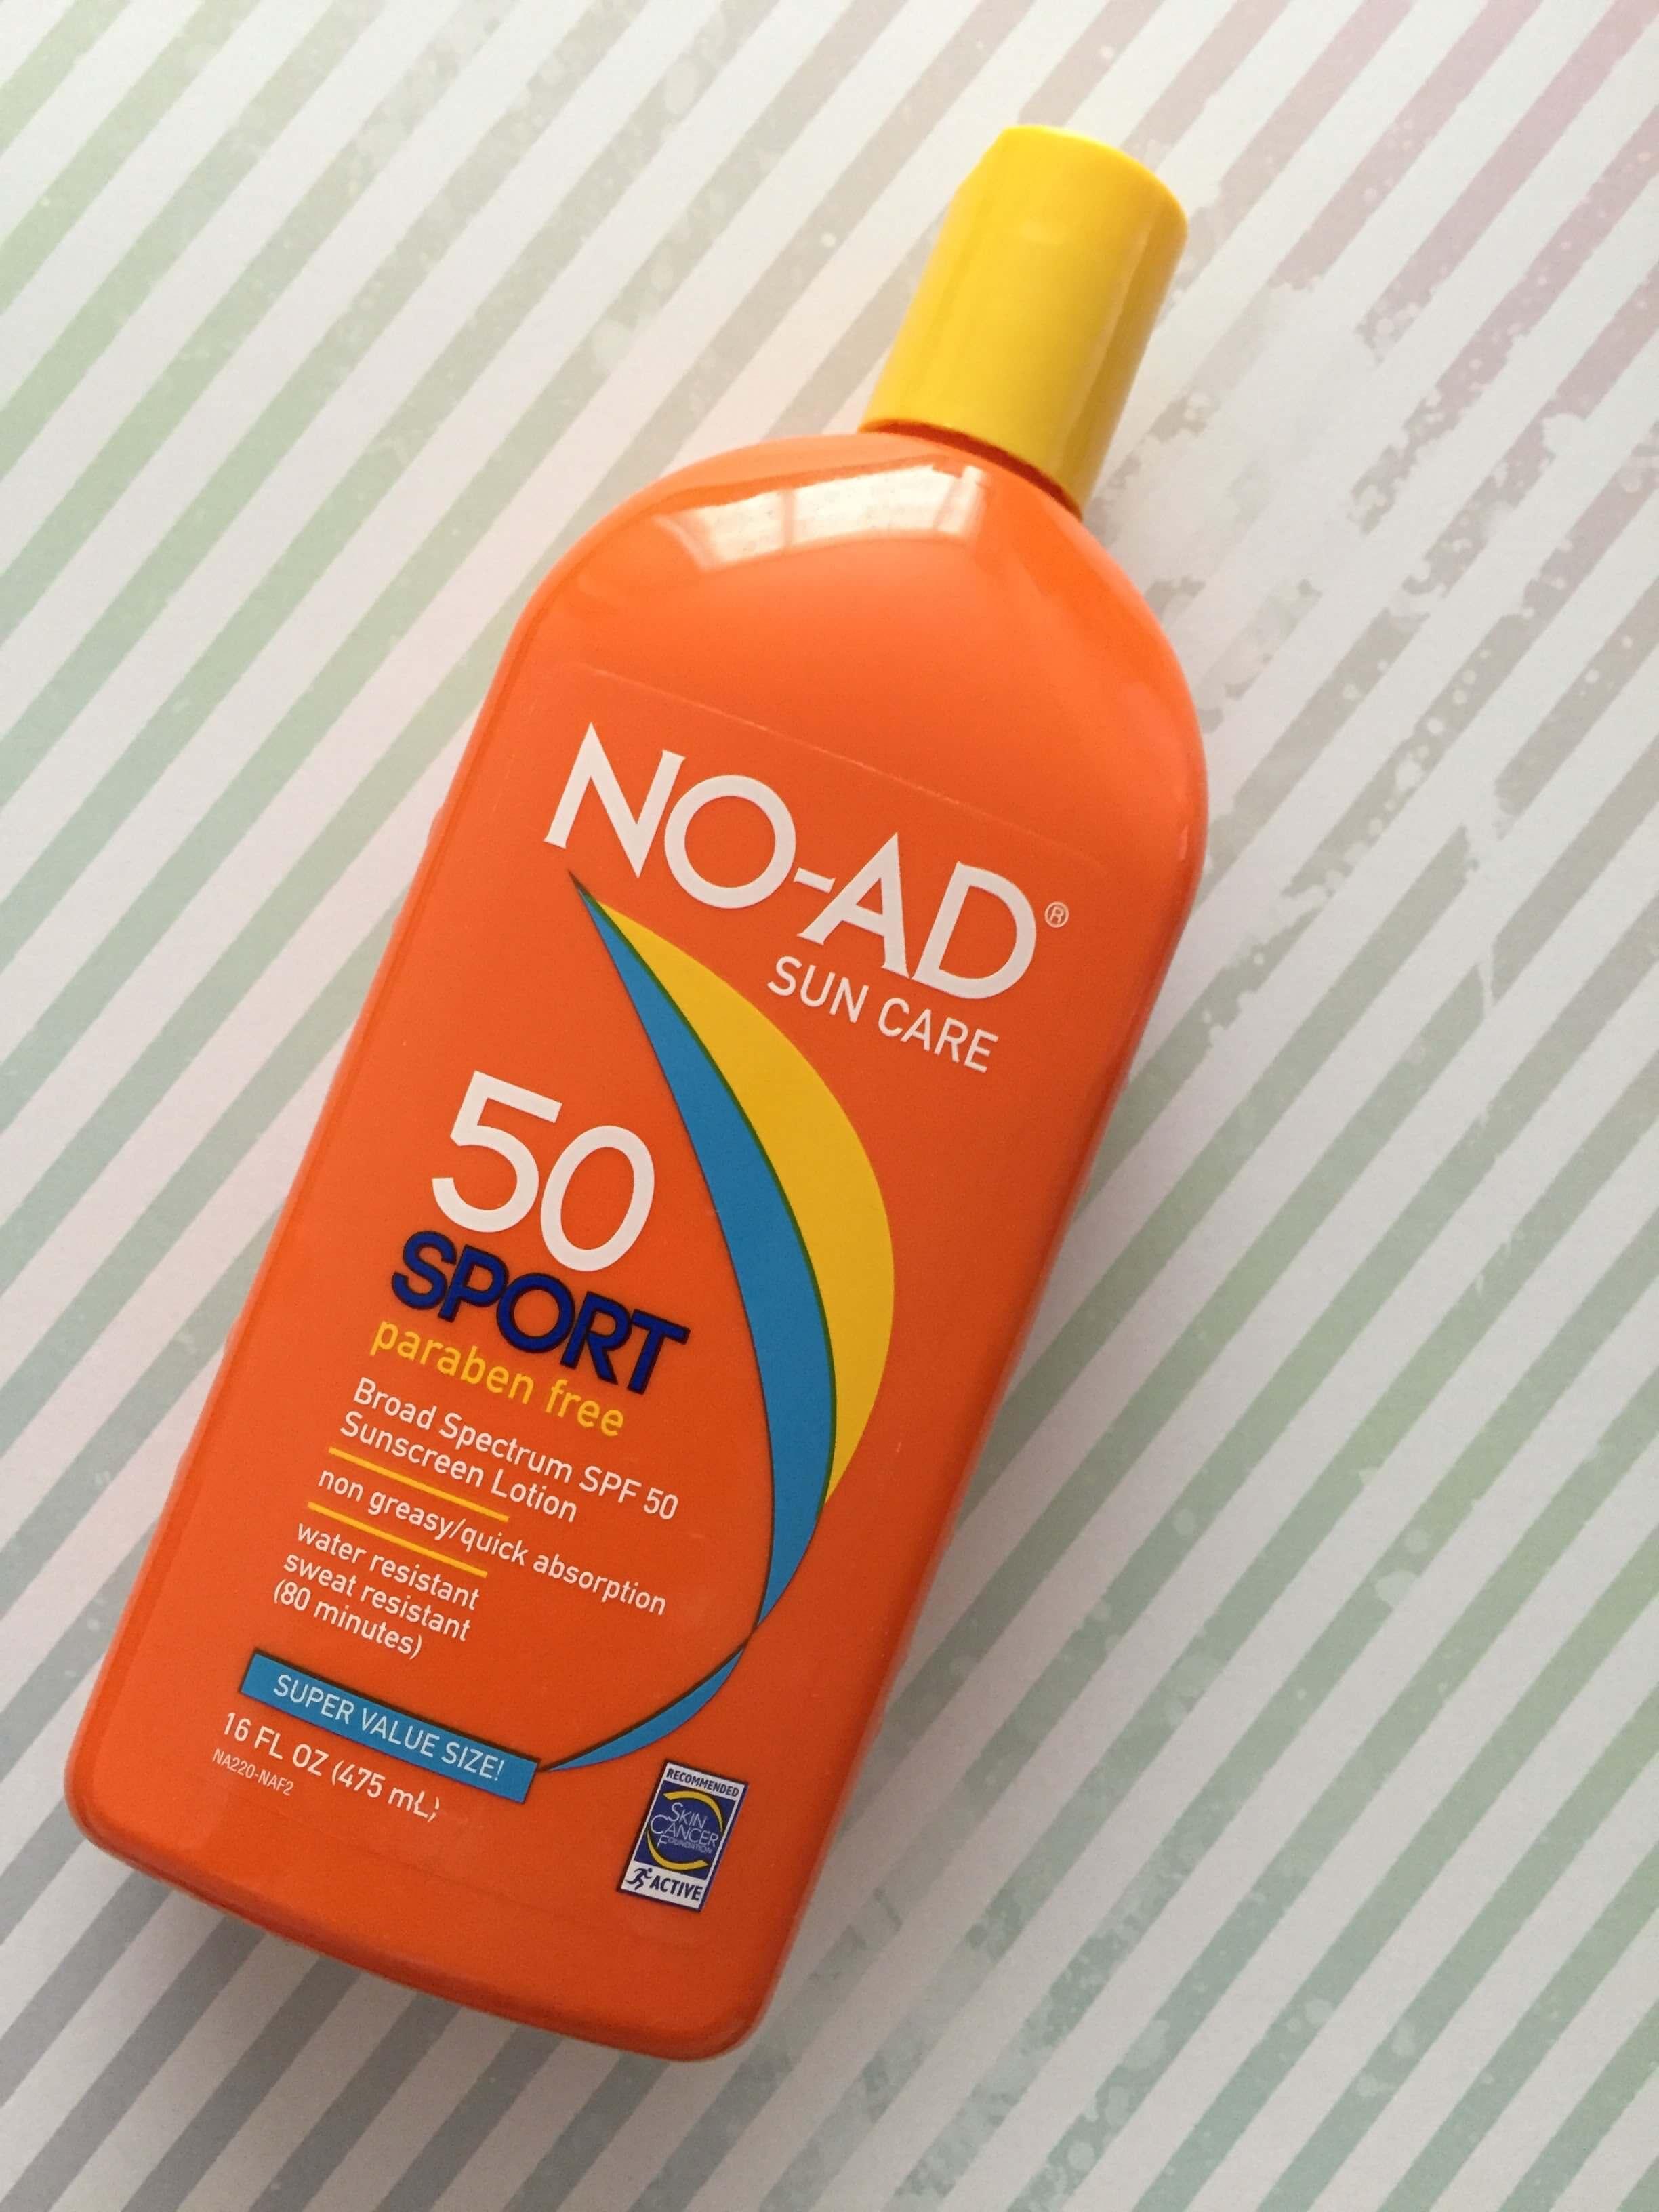 NO-AD Sport Sunscreen, SPF 50 Review